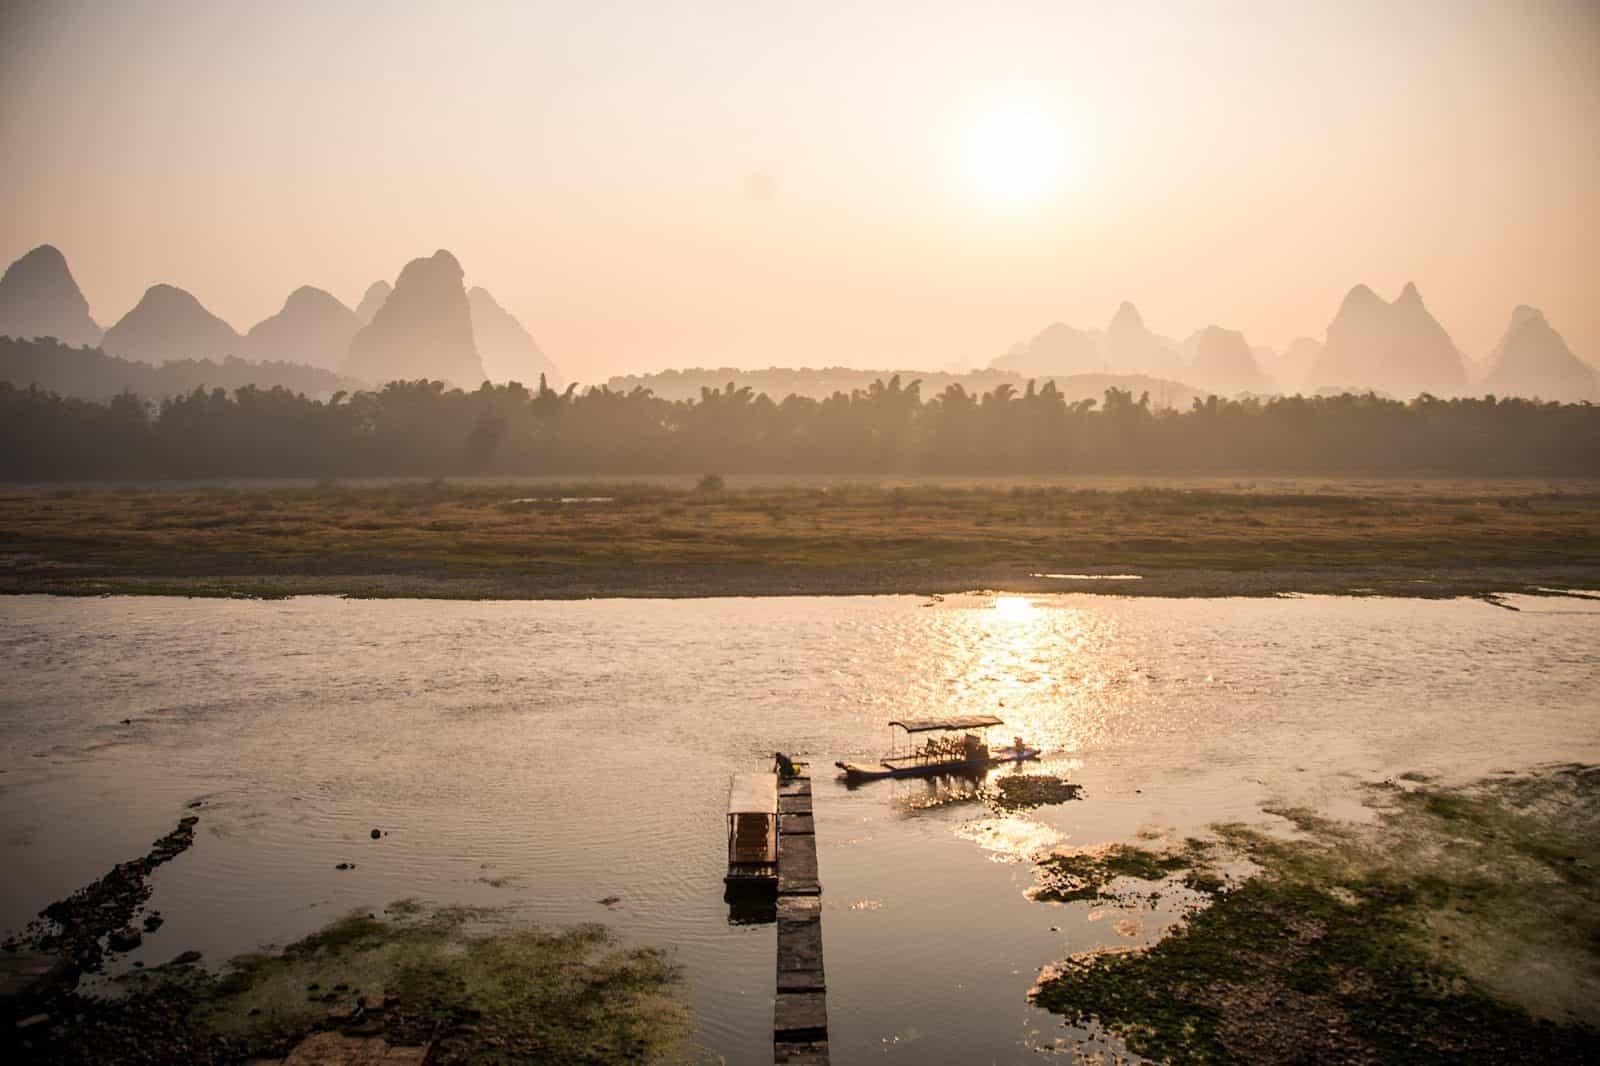 Lijang River